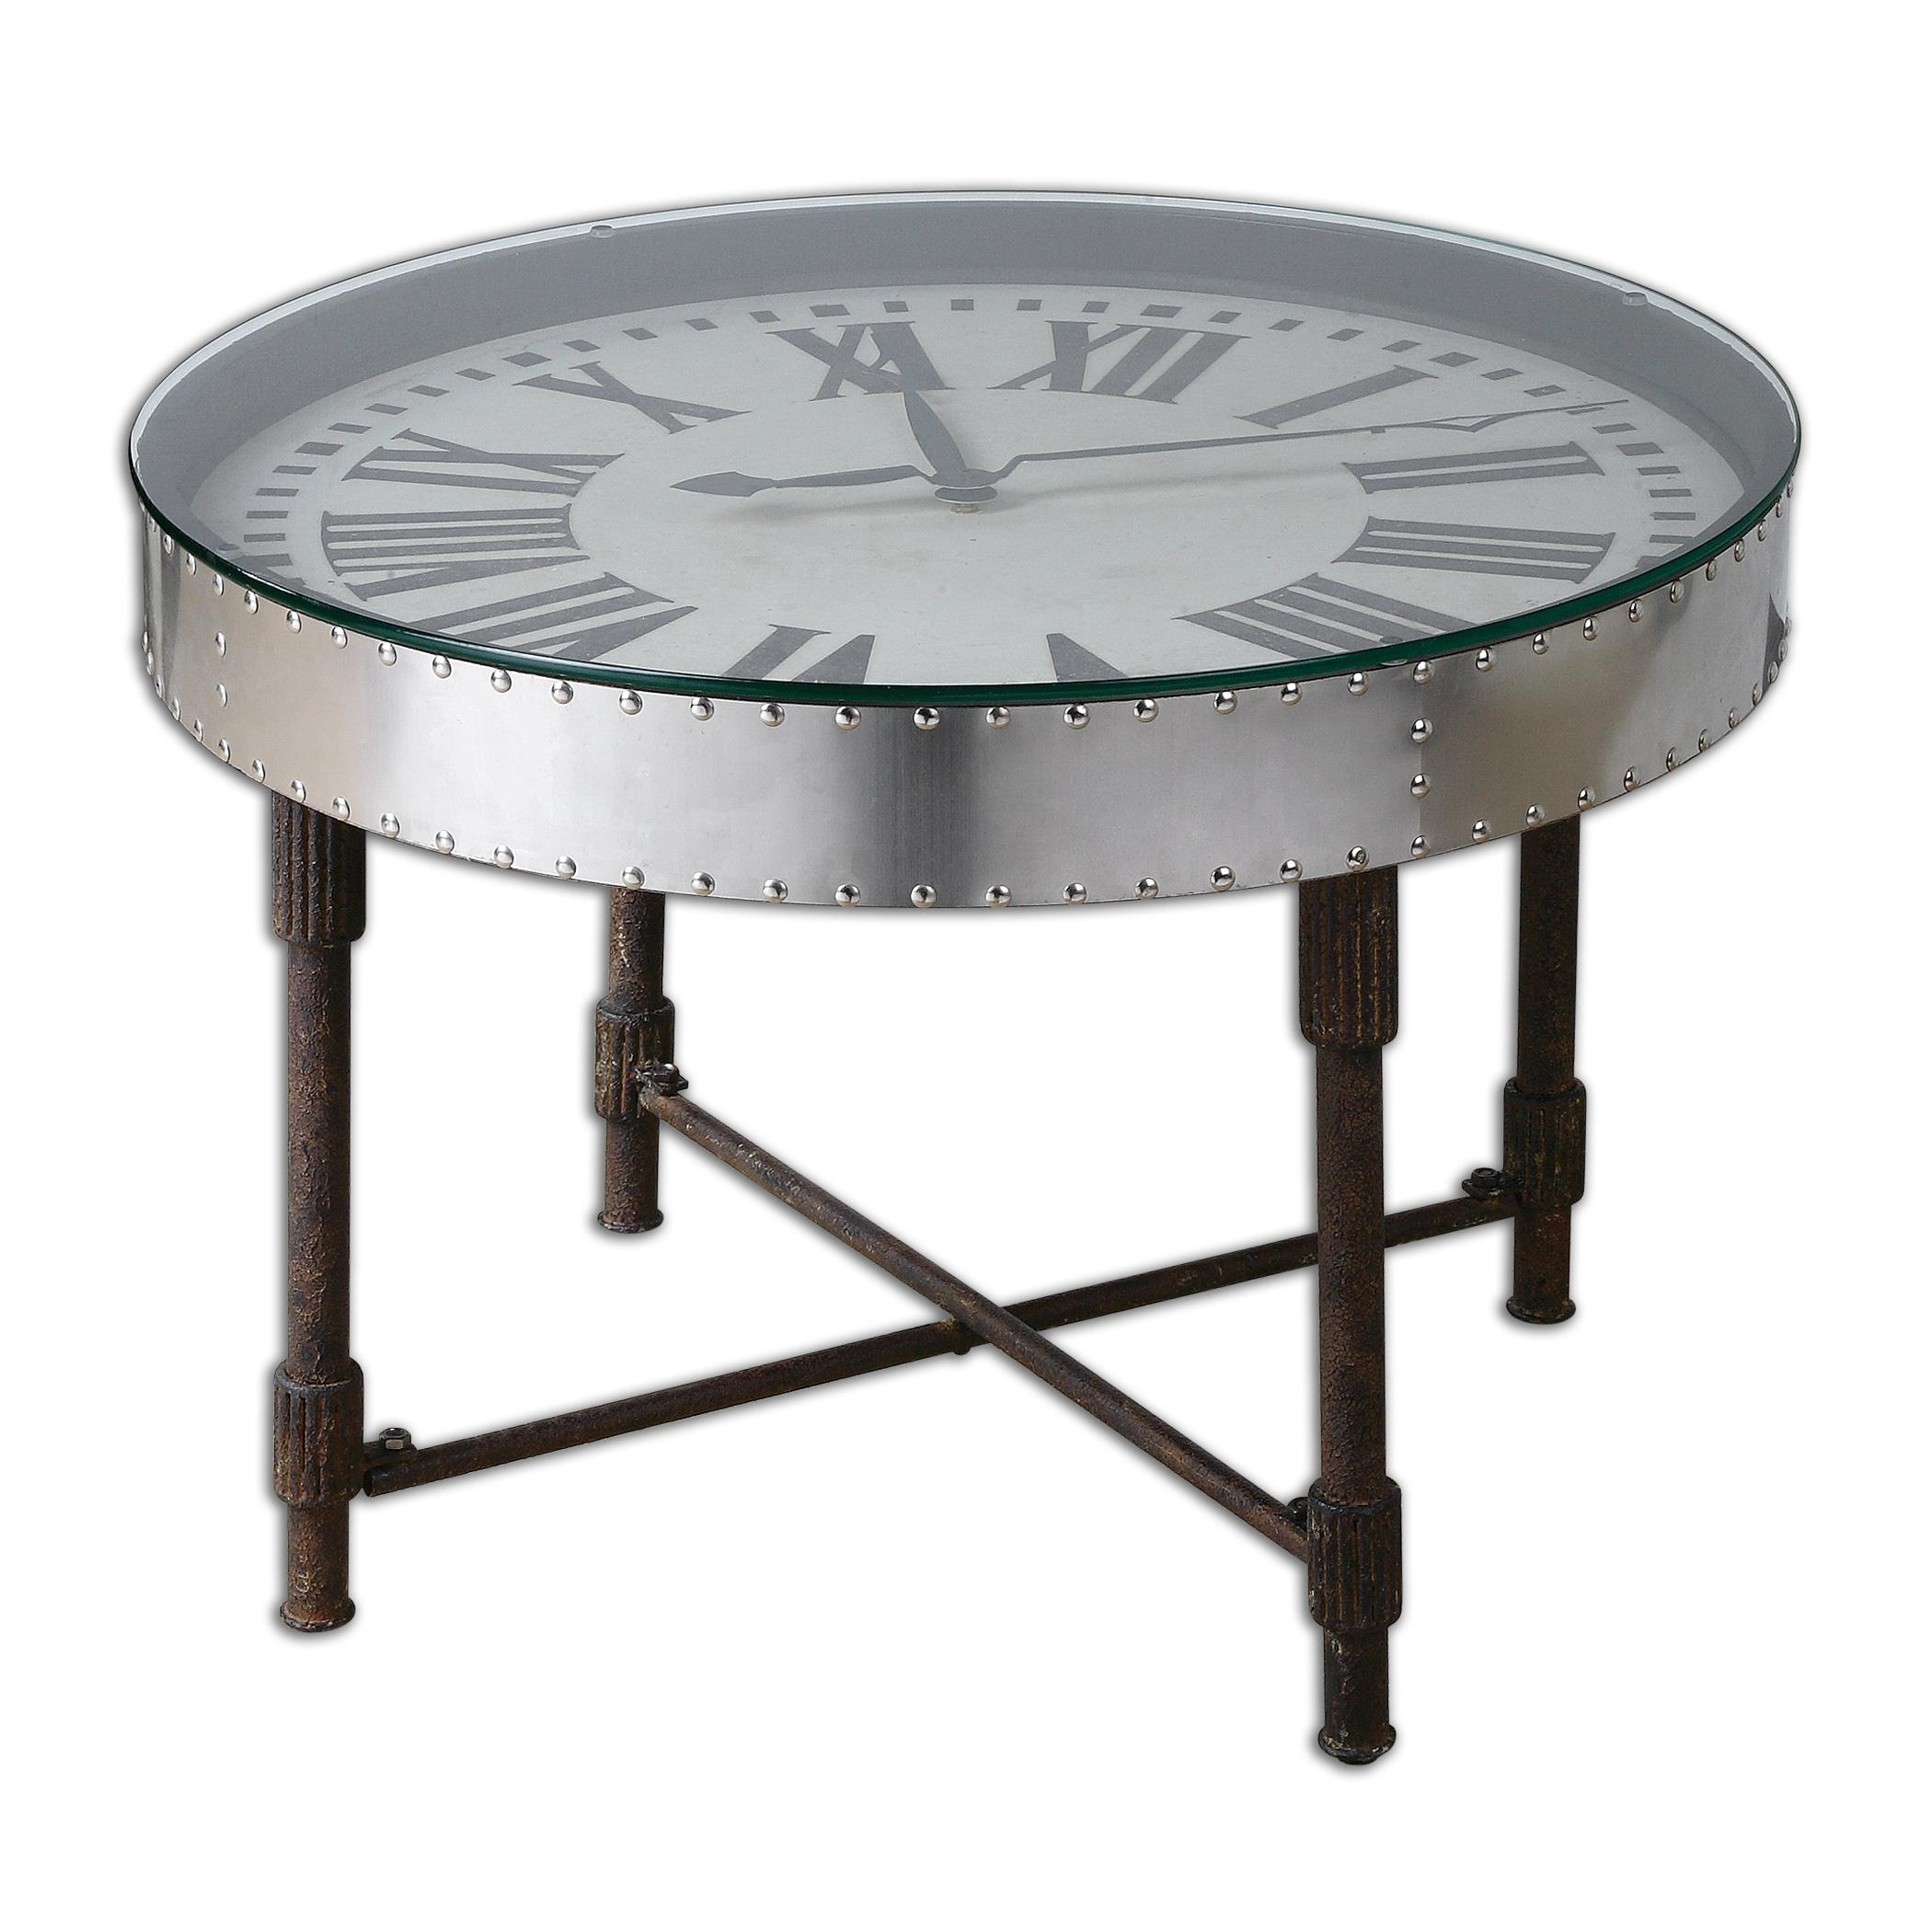 Uttermost Accent Furniture Cassem Clock Table - Item Number: 24321